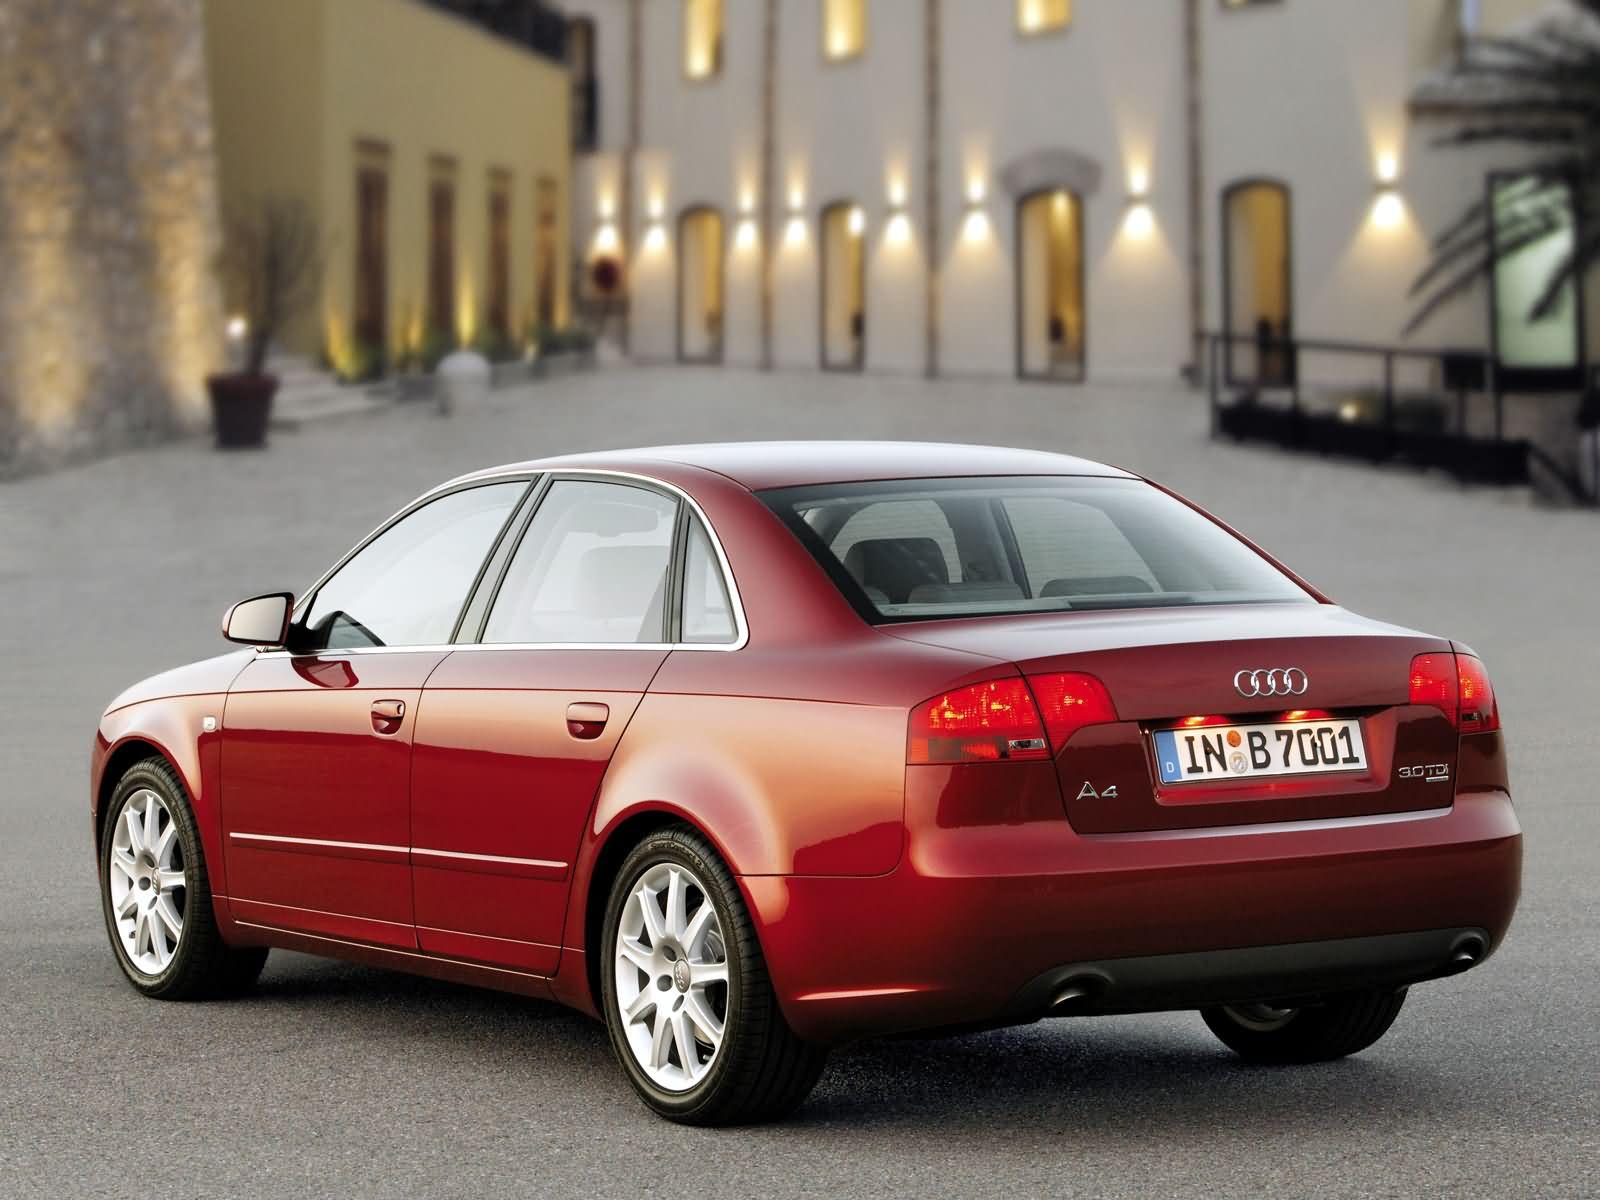 Замена выключателя стоп-сигналов на Audi A4 B7